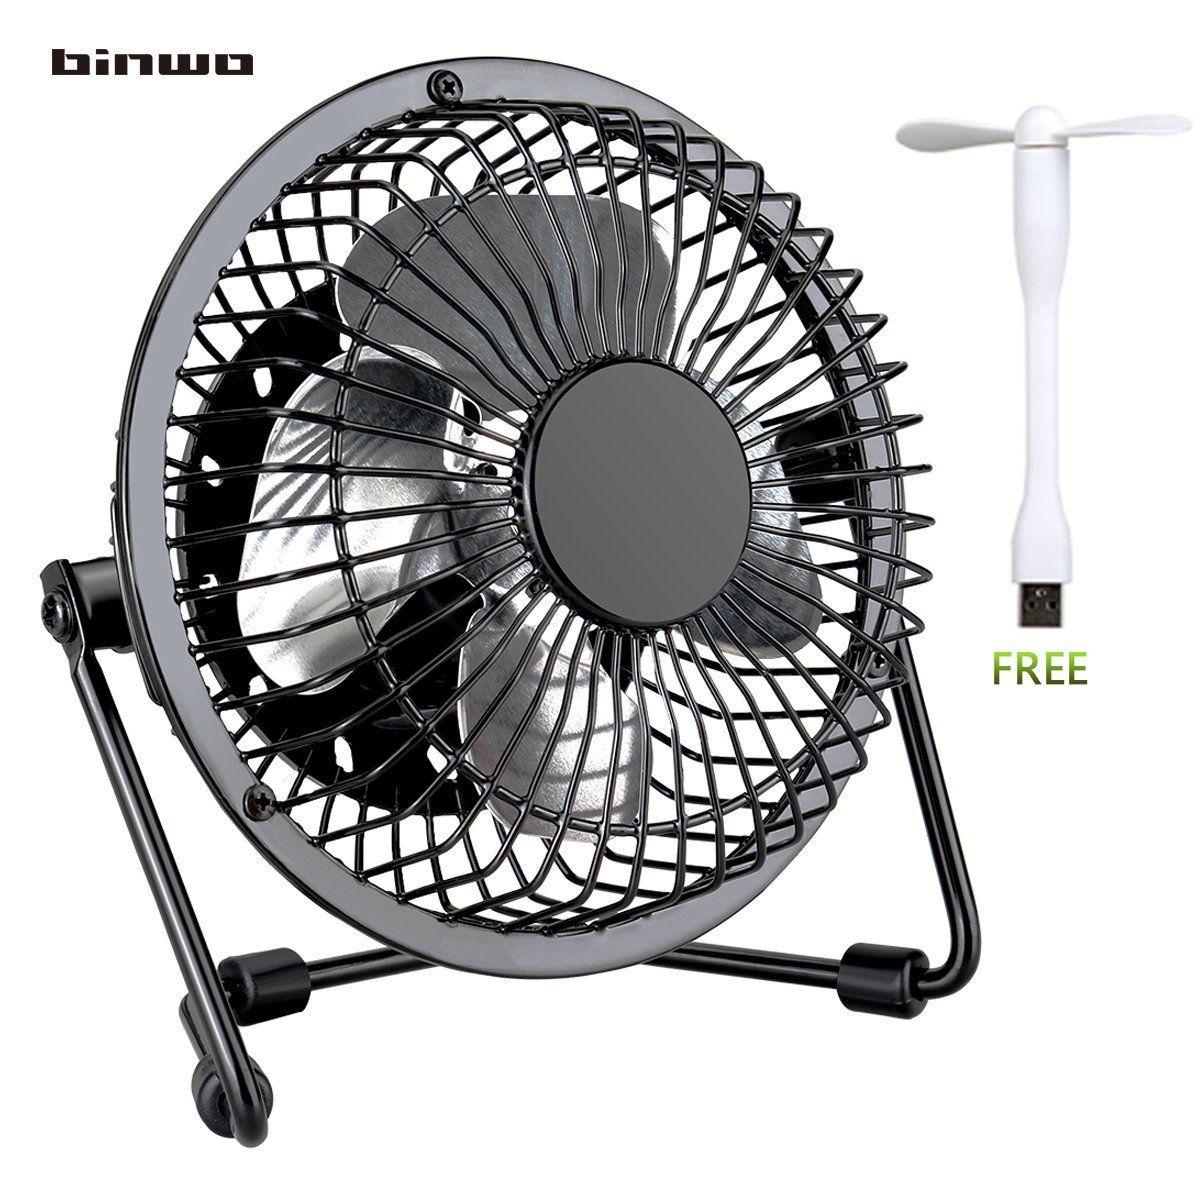 Fan Blade Inuries : Binwo quiet mini desk usb fan portable metal cooling